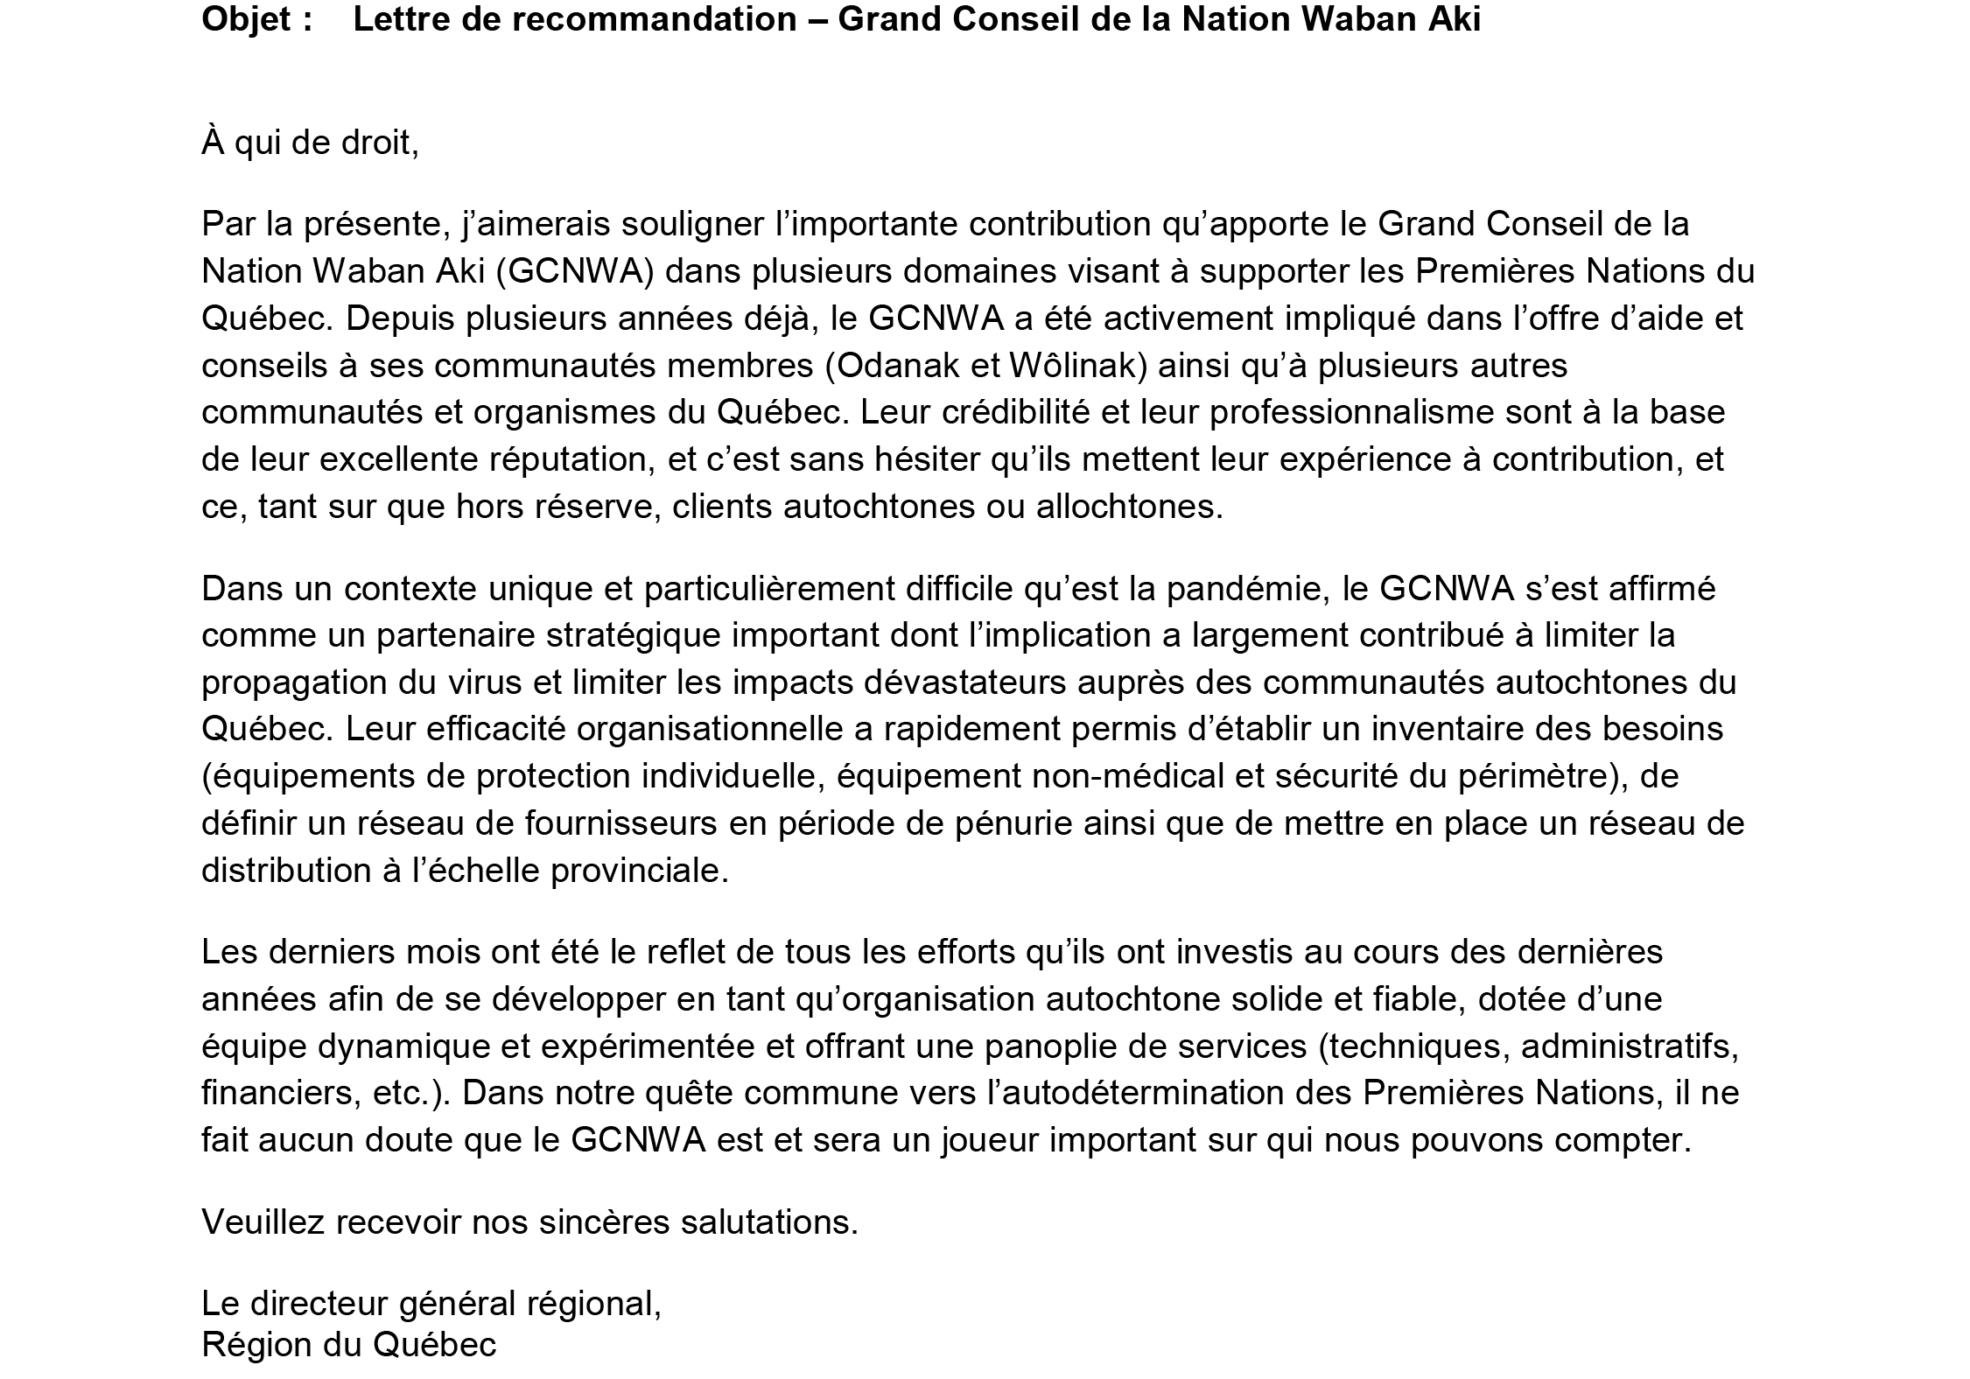 LETTRE-RECOMMANDATION-WABAN-AKI-MARS-2021-1